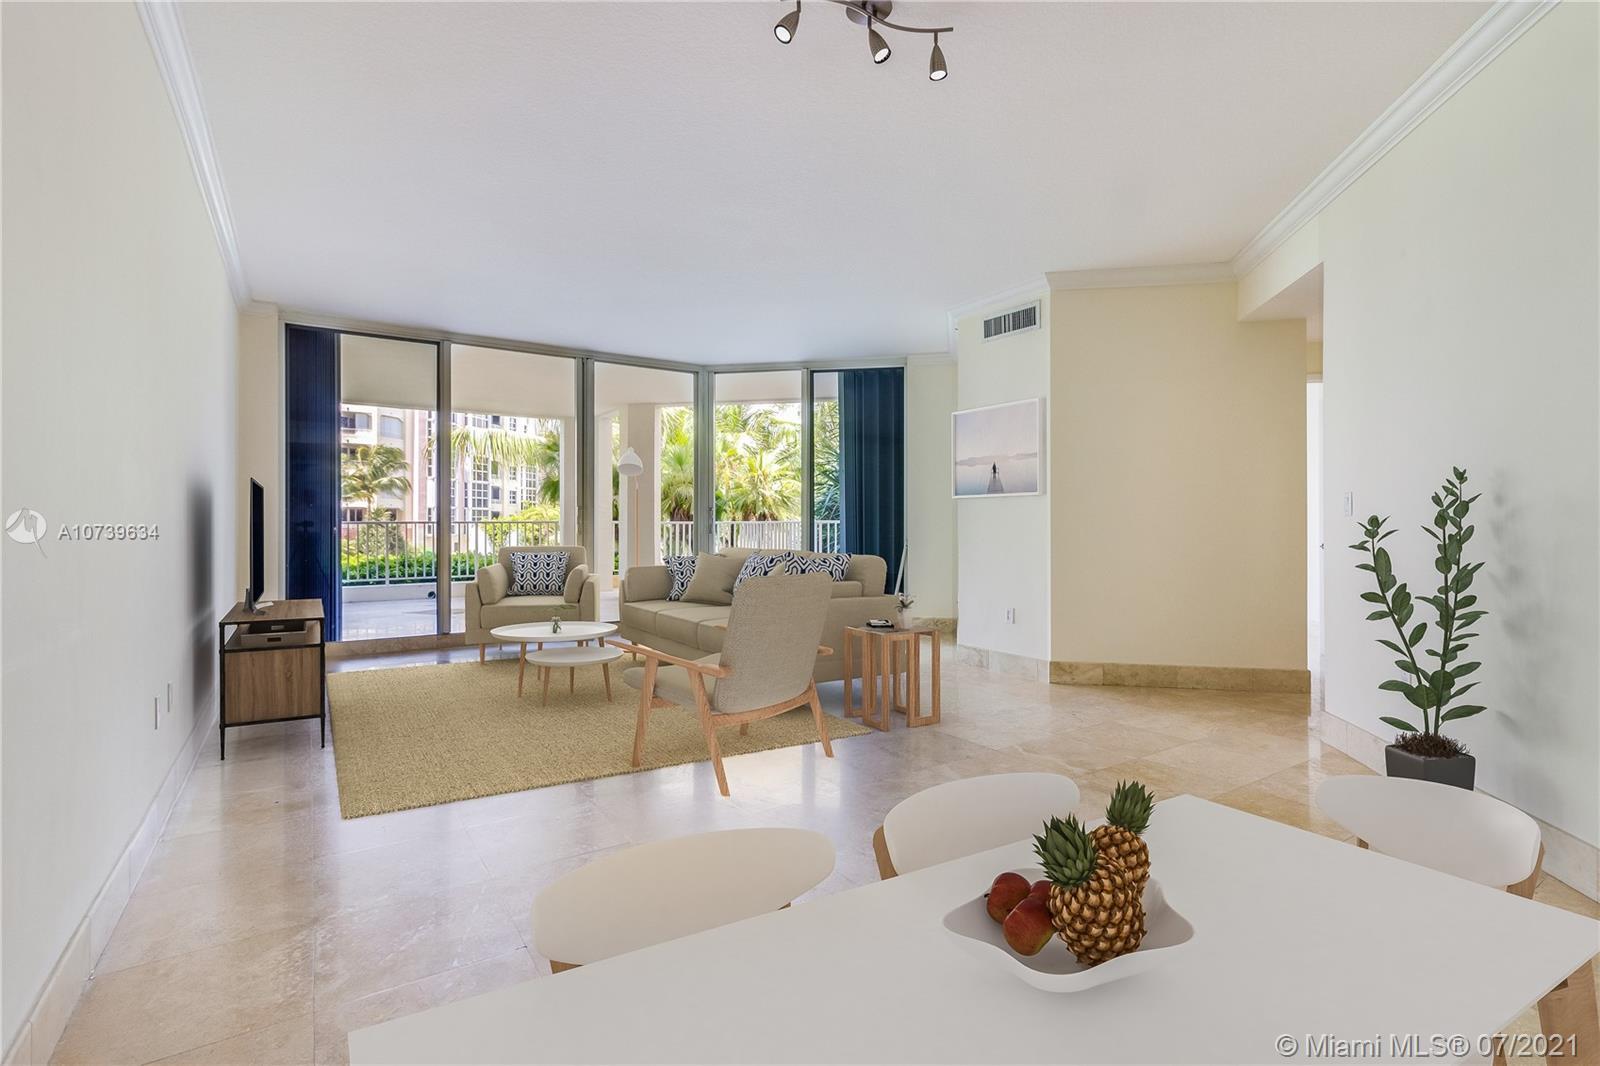 705 Crandon Blvd # 205, Key Biscayne, Florida 33149, 2 Bedrooms Bedrooms, ,2 BathroomsBathrooms,Residential,For Sale,705 Crandon Blvd # 205,A10739634